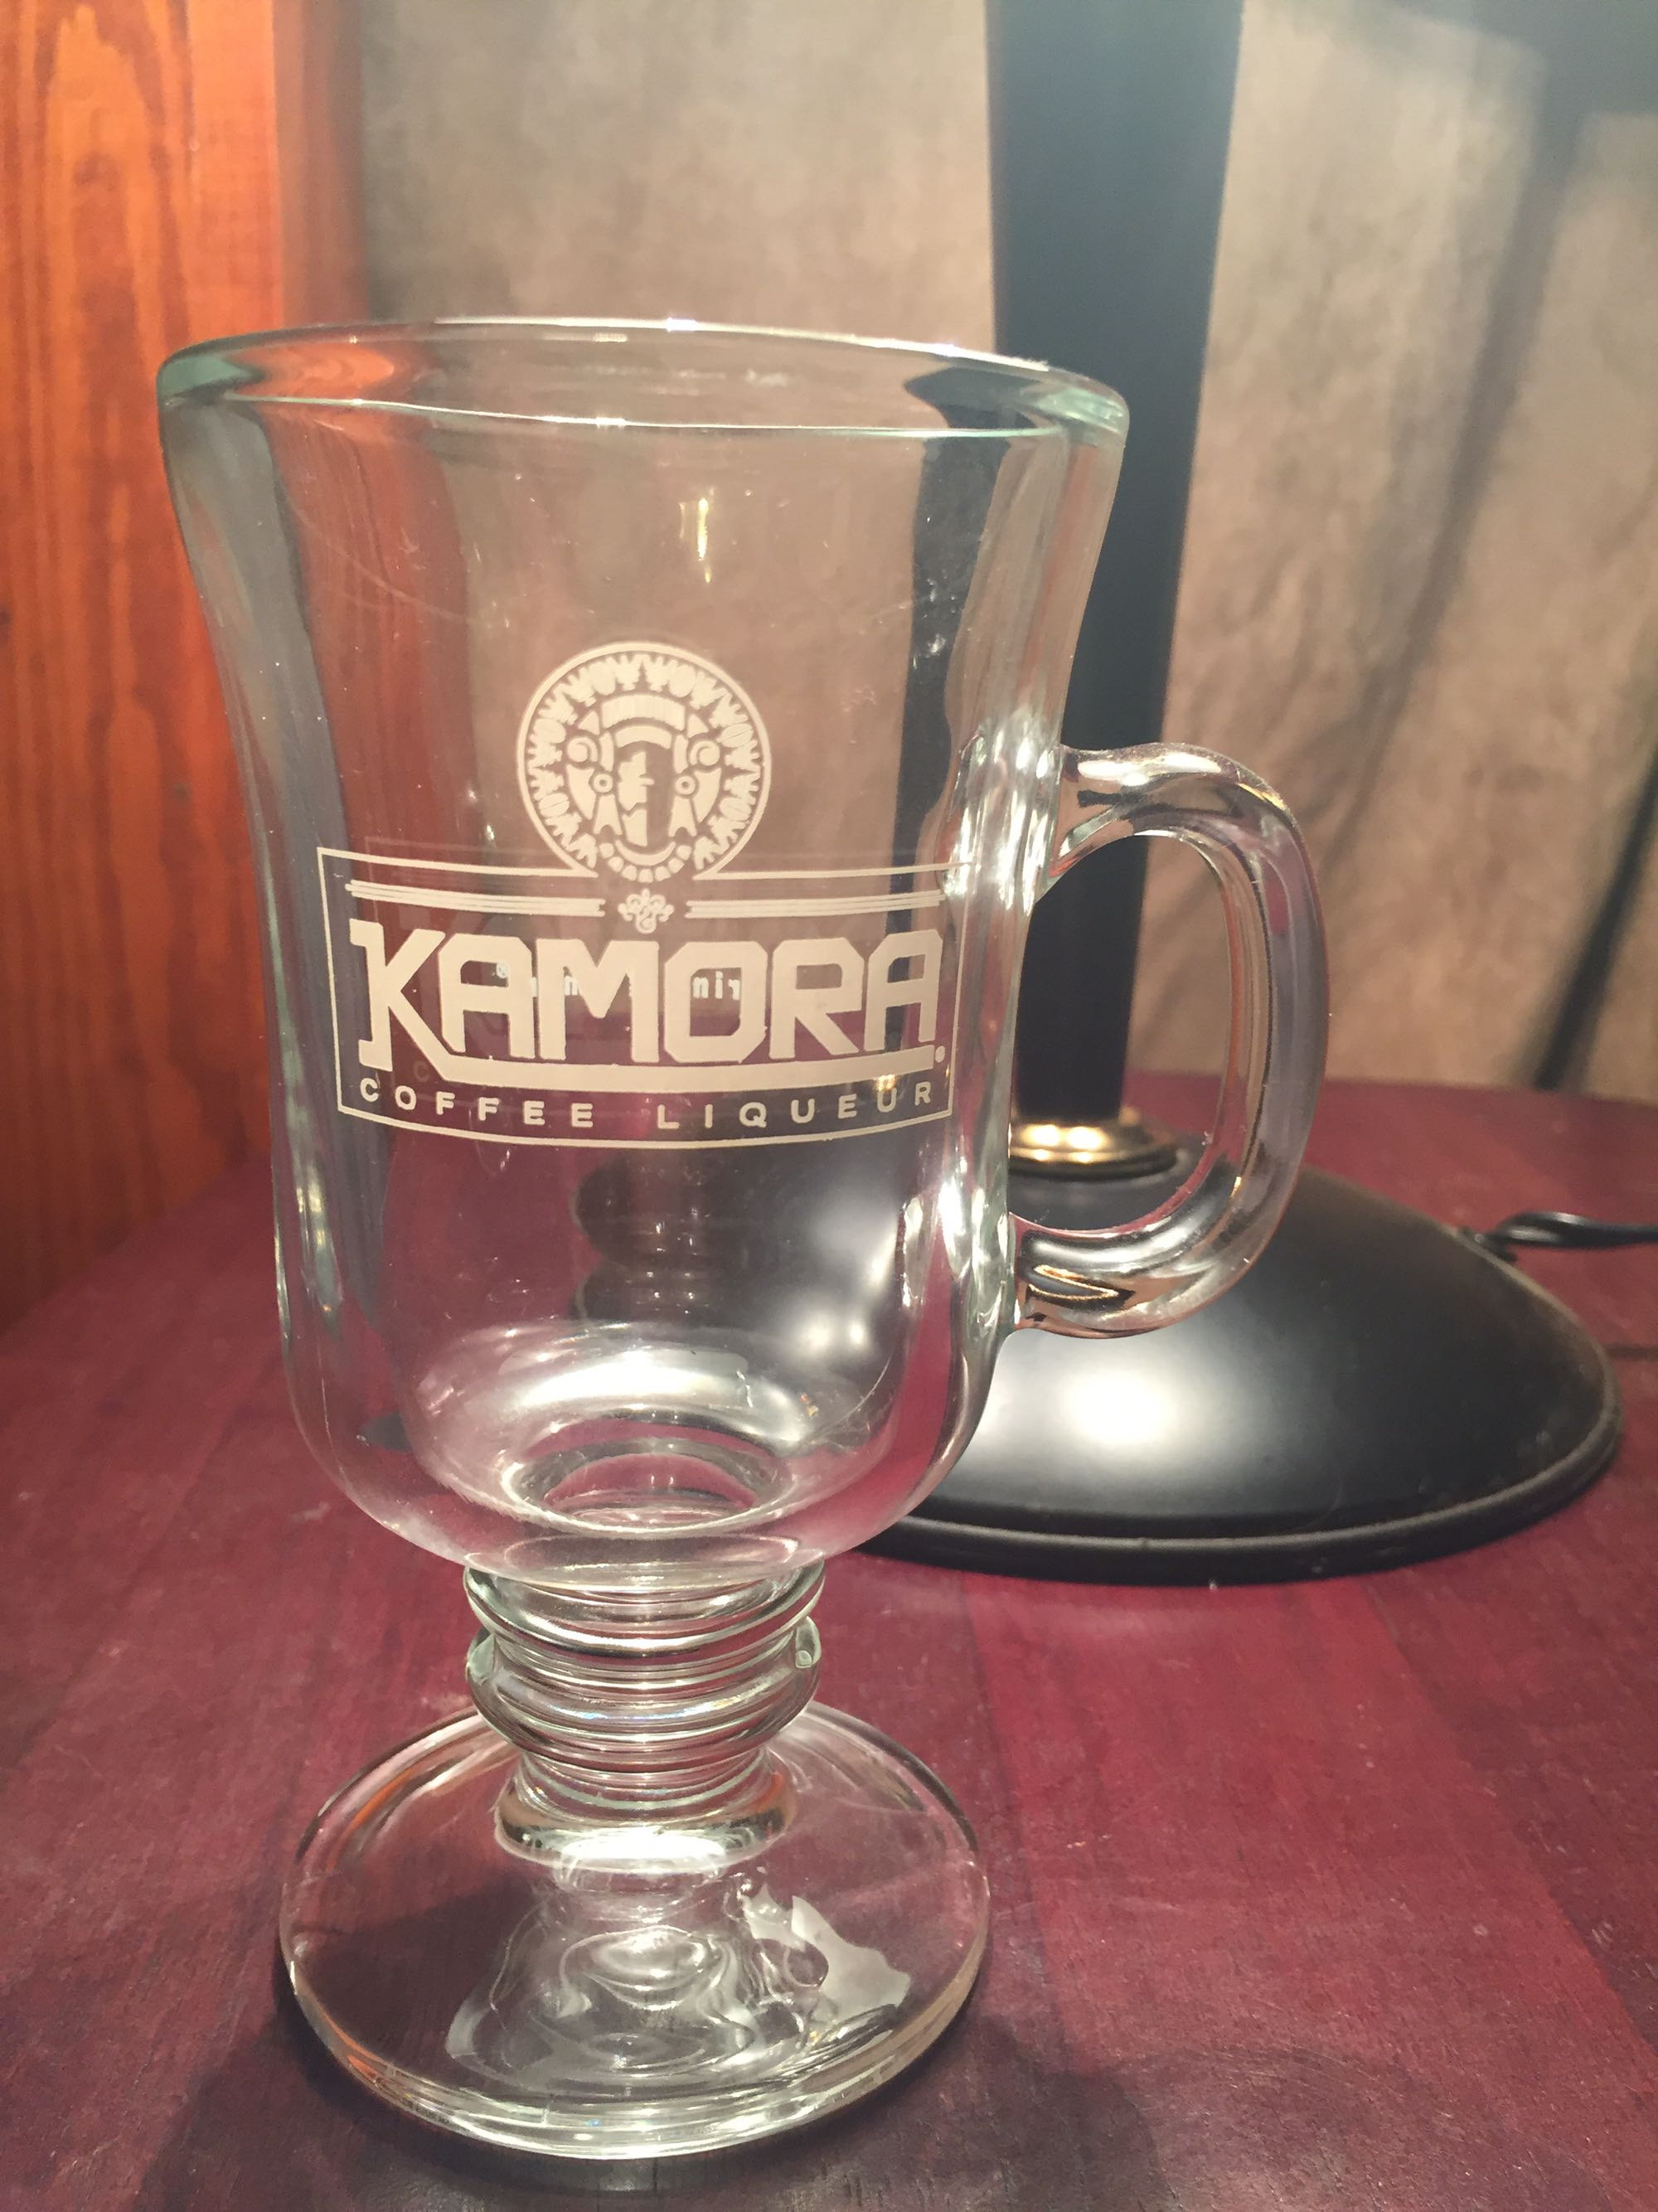 Kamora coffee liqueur glass cup